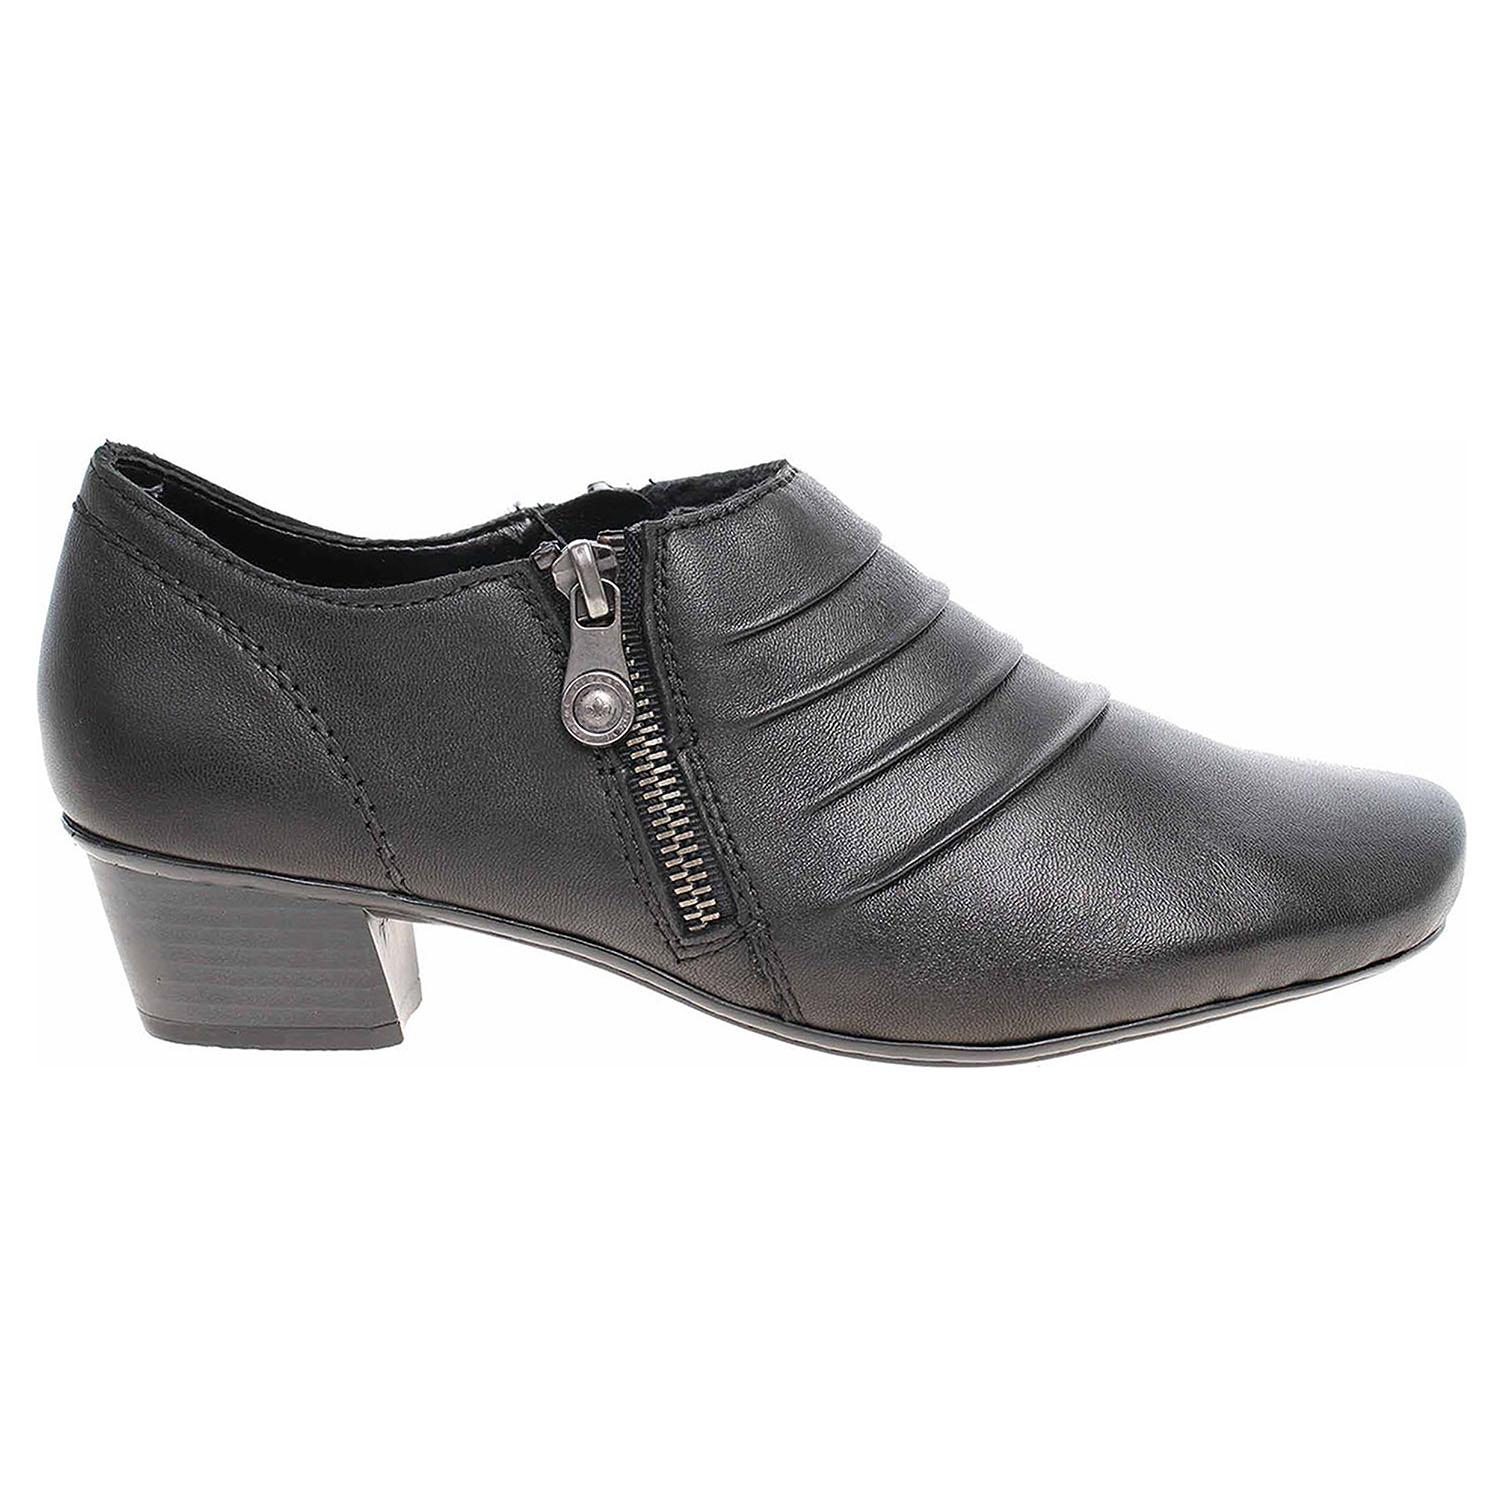 Rieker dámská obuv 53871-01 schwarz  791ad8854a